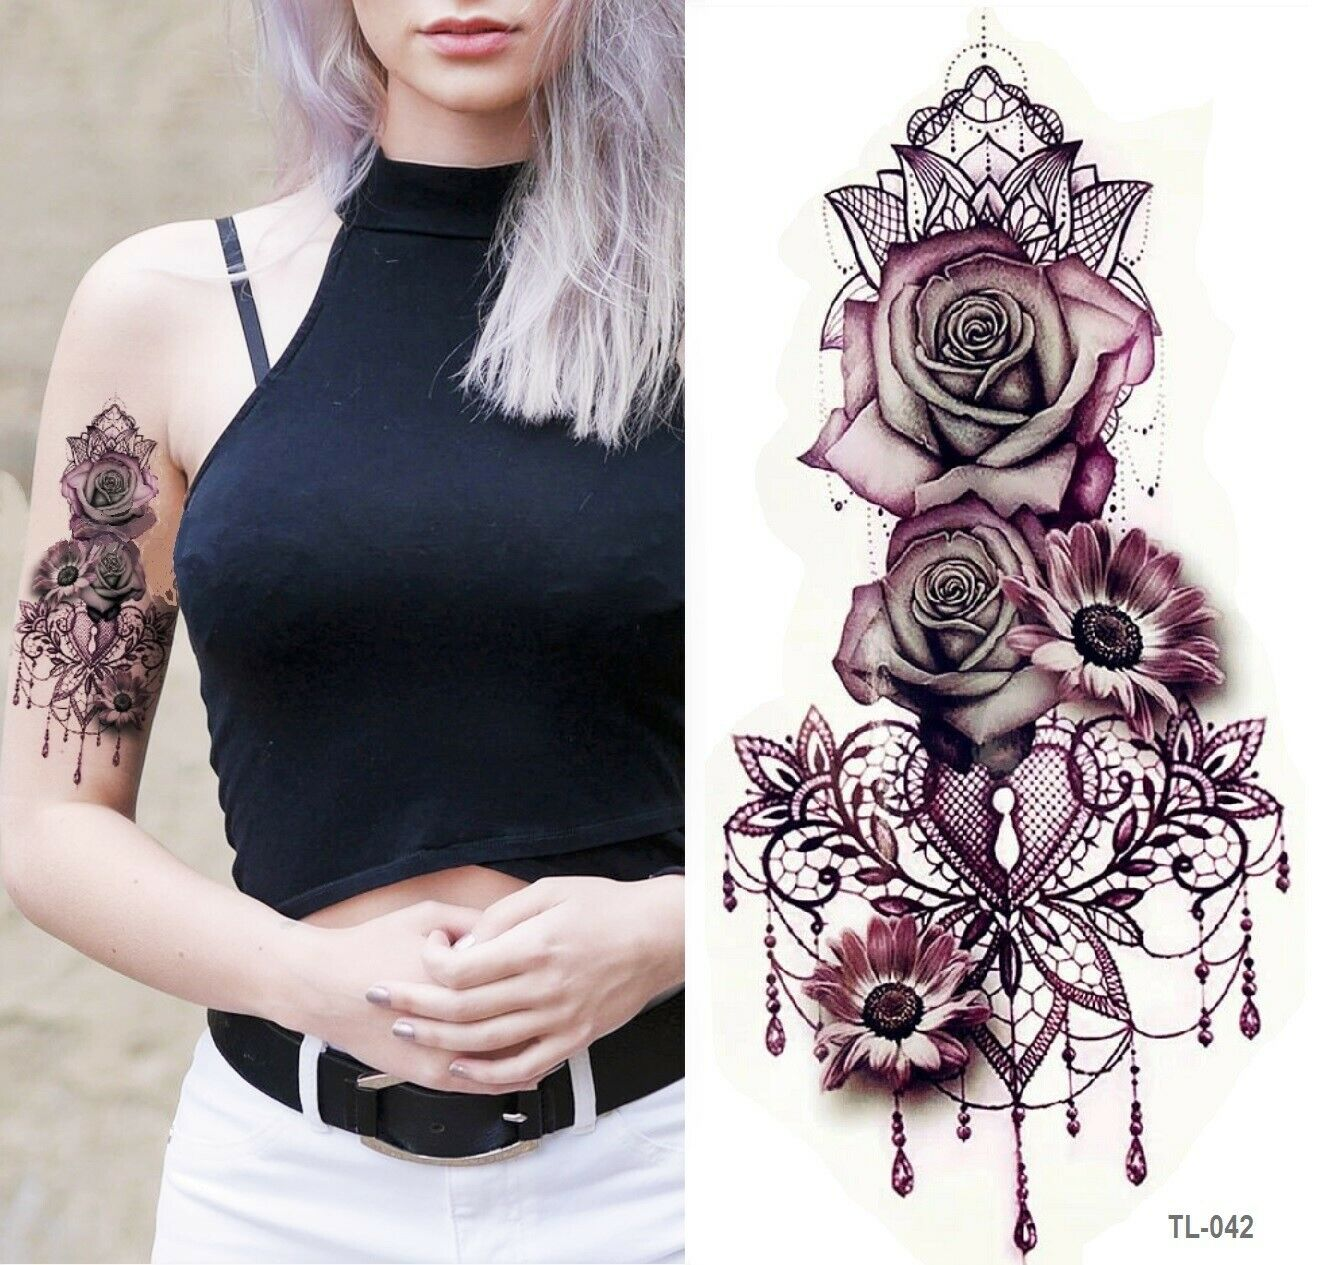 Blume Einmal Tattoos Blumen rose Temporäre Tattoo Body Sticker 19 x 9cm NEU!